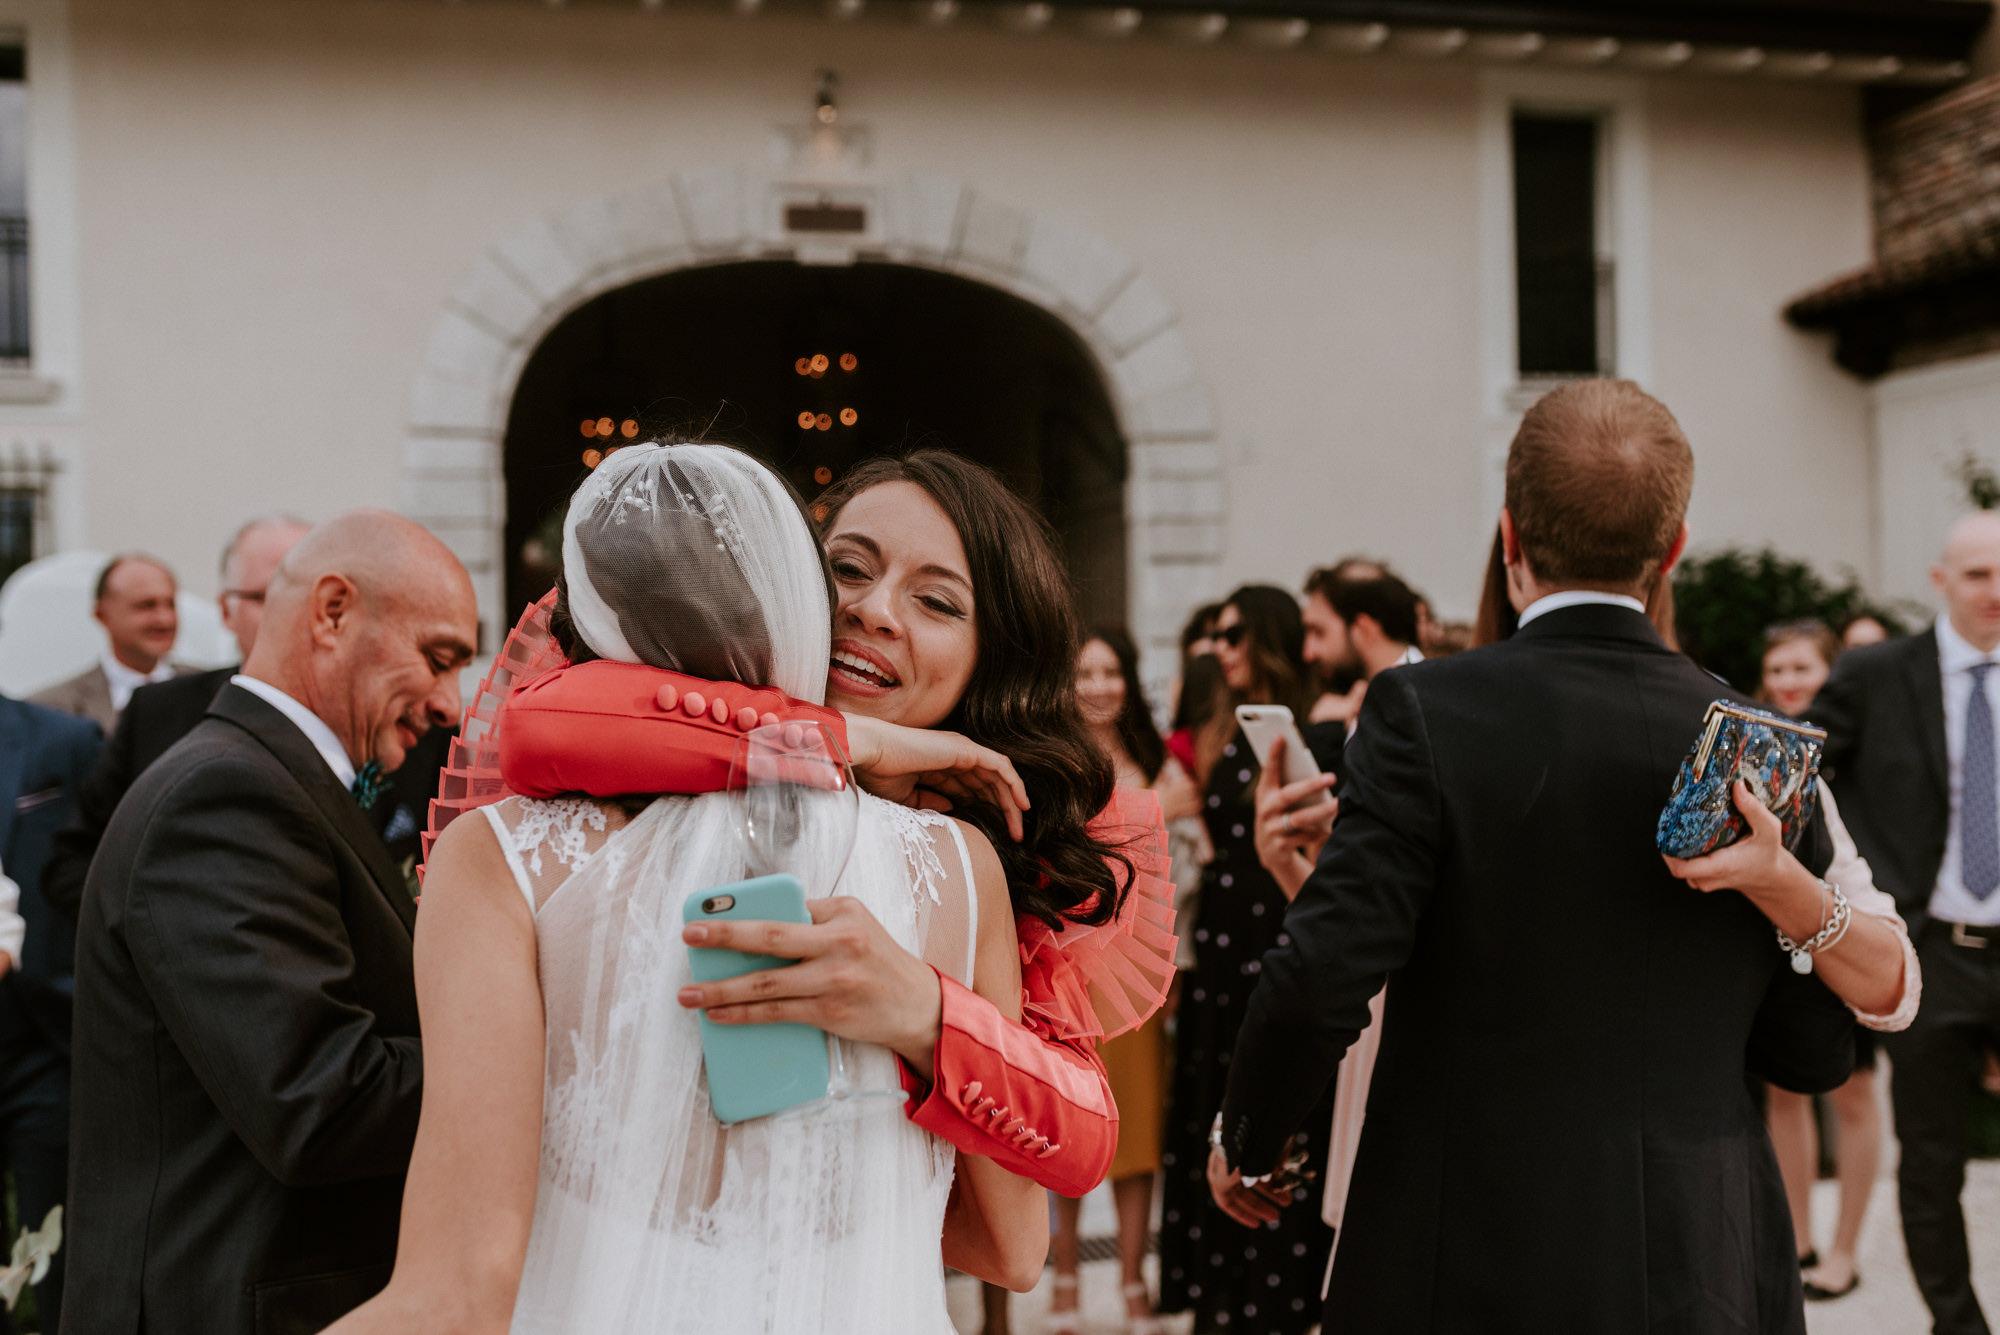 FOTO+PHOTO+BODA+WEDDING+ITALIA+ITALY+MAURICIO+GARAY+MAURICIOGARAY+WEDDINPHOTOGRAPHER+FOTOGRAFODEBODA-1385.jpg